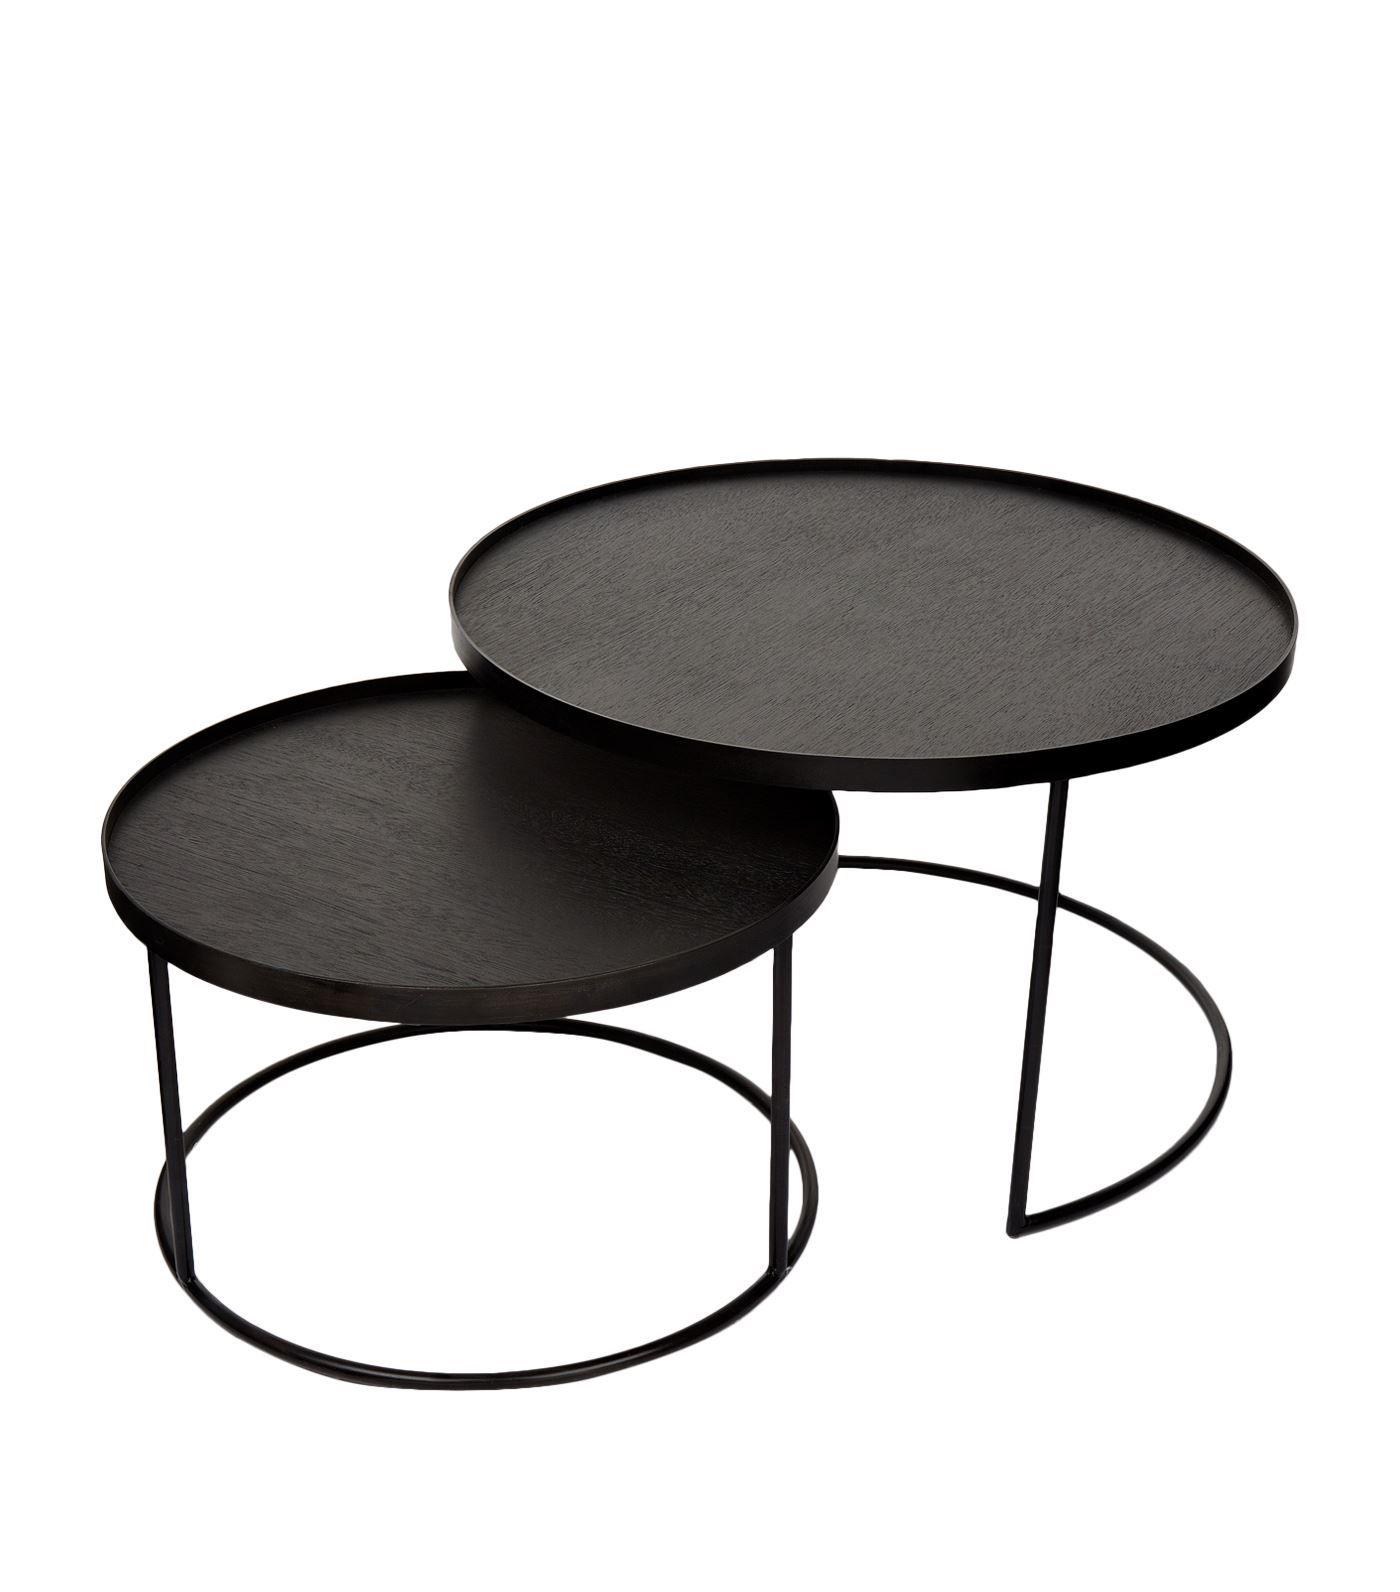 Notre Monde Round Tray Tables Set Of 2 Harrods Com Nesting Coffee Tables Round Metal Coffee Table Round Nesting Coffee Tables [ 1592 x 1400 Pixel ]